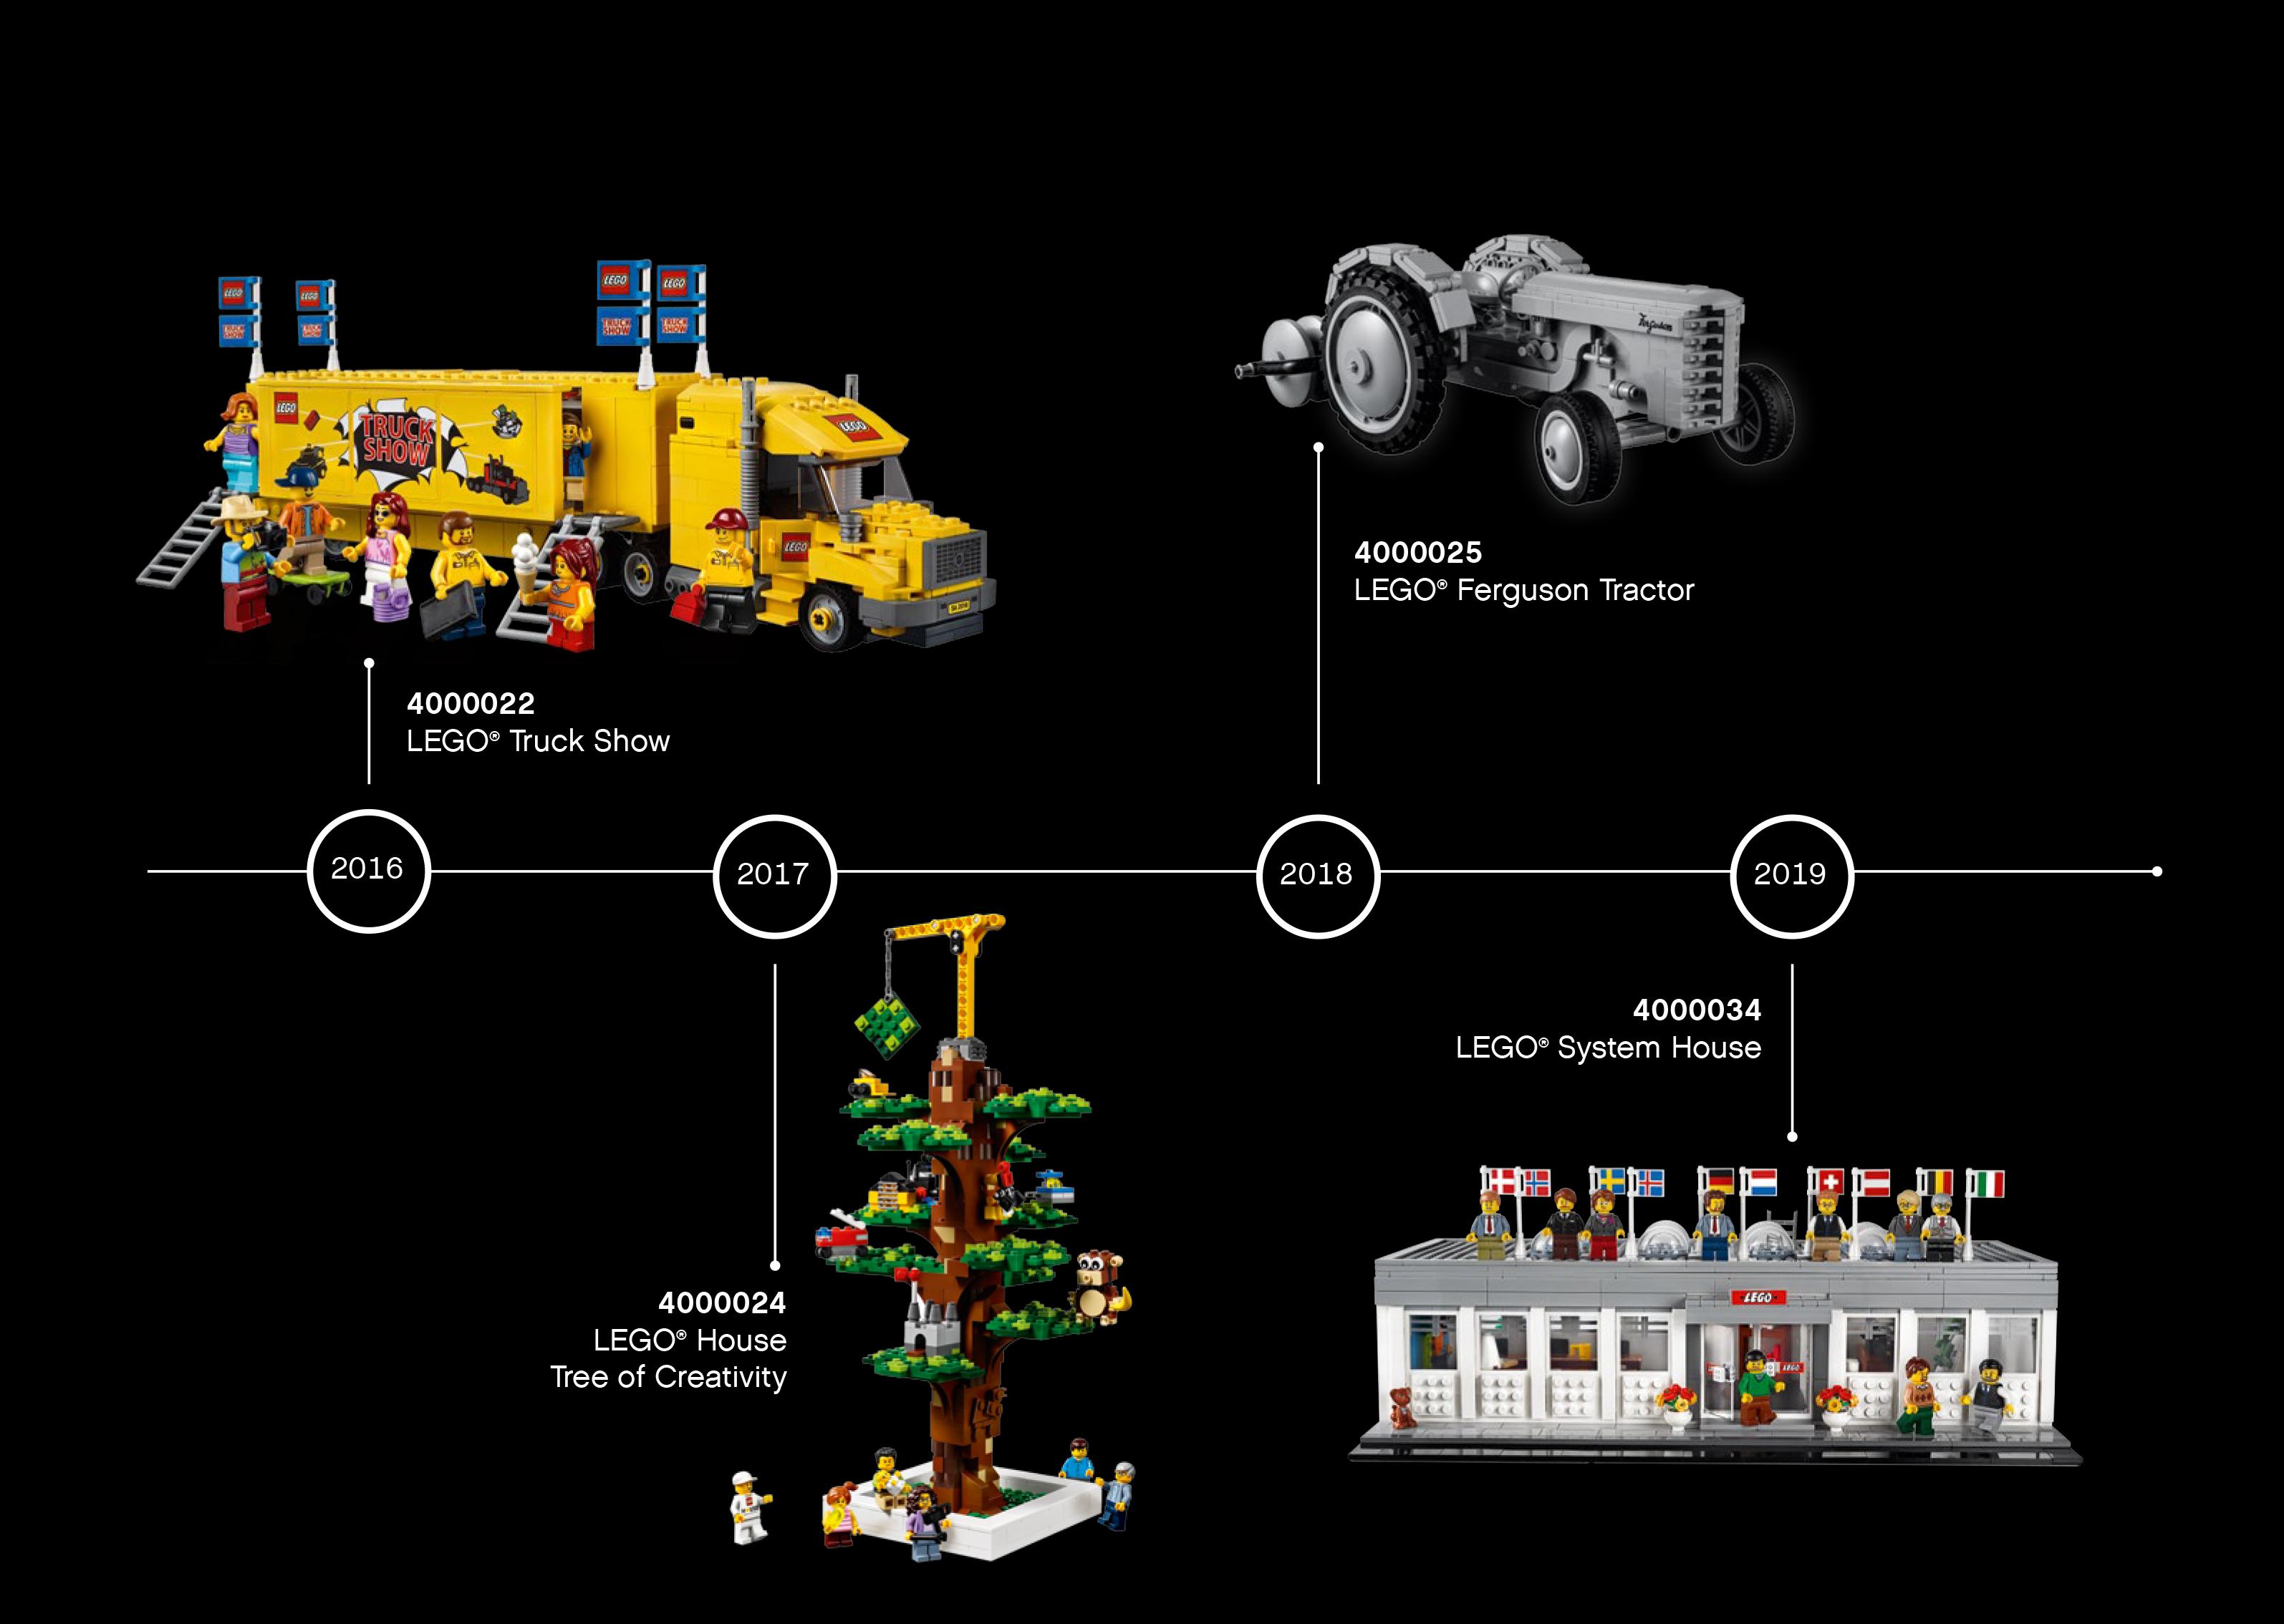 lego-idea-house-4000034-uebersicht zusammengebaut.com